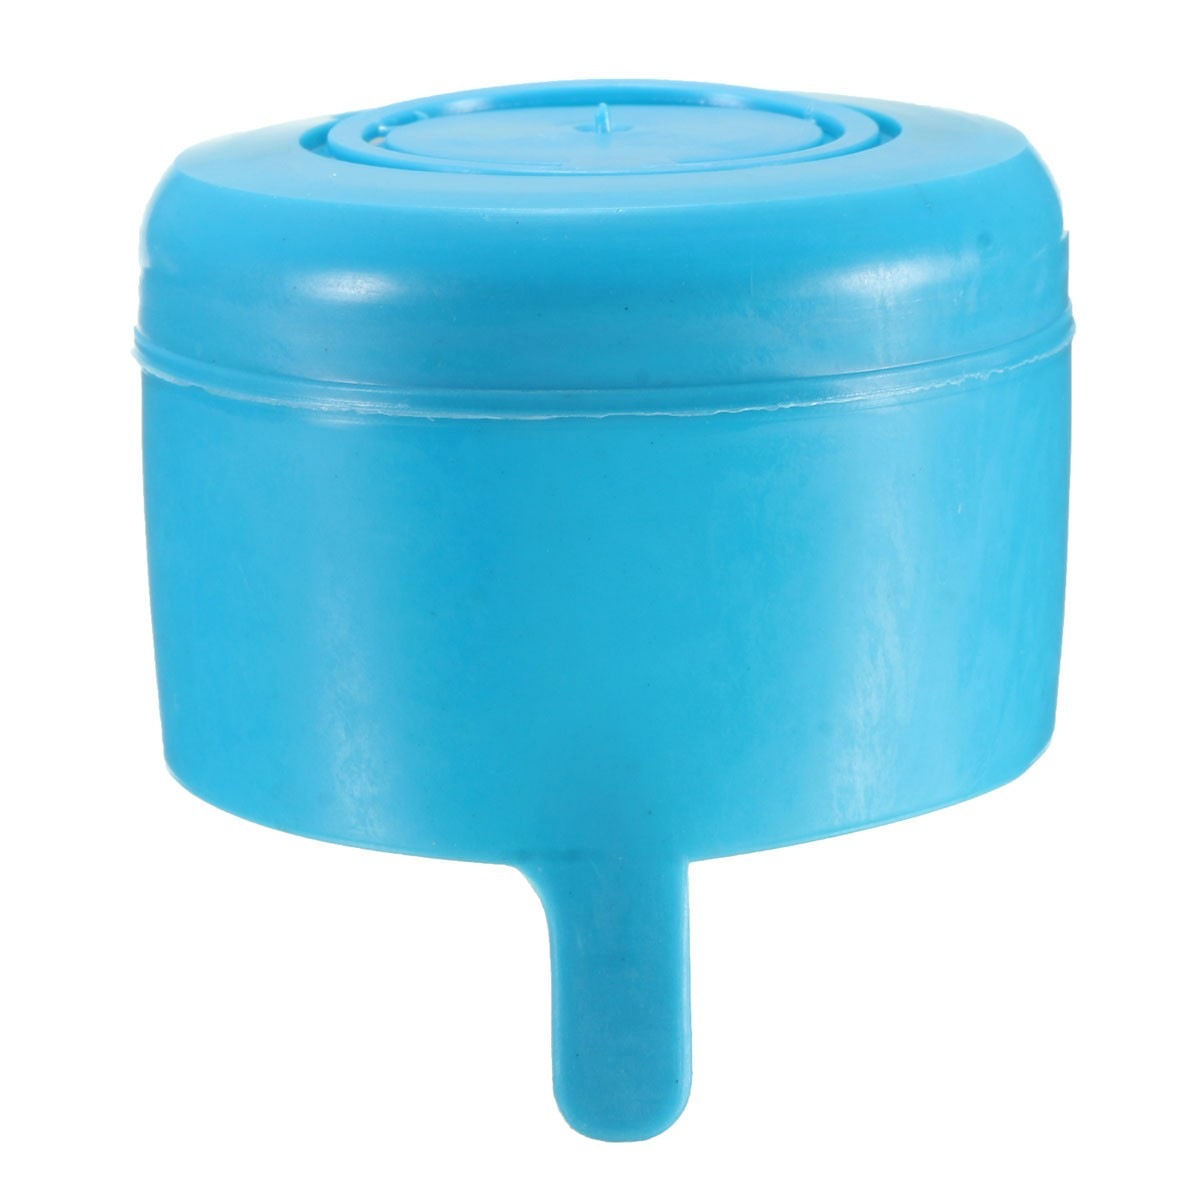 1pcs 3 & 5 Gallon Replacemet Water Bottle Snap On Cap Anti Splash Peel Off Tops travel kits(China (Mainland))